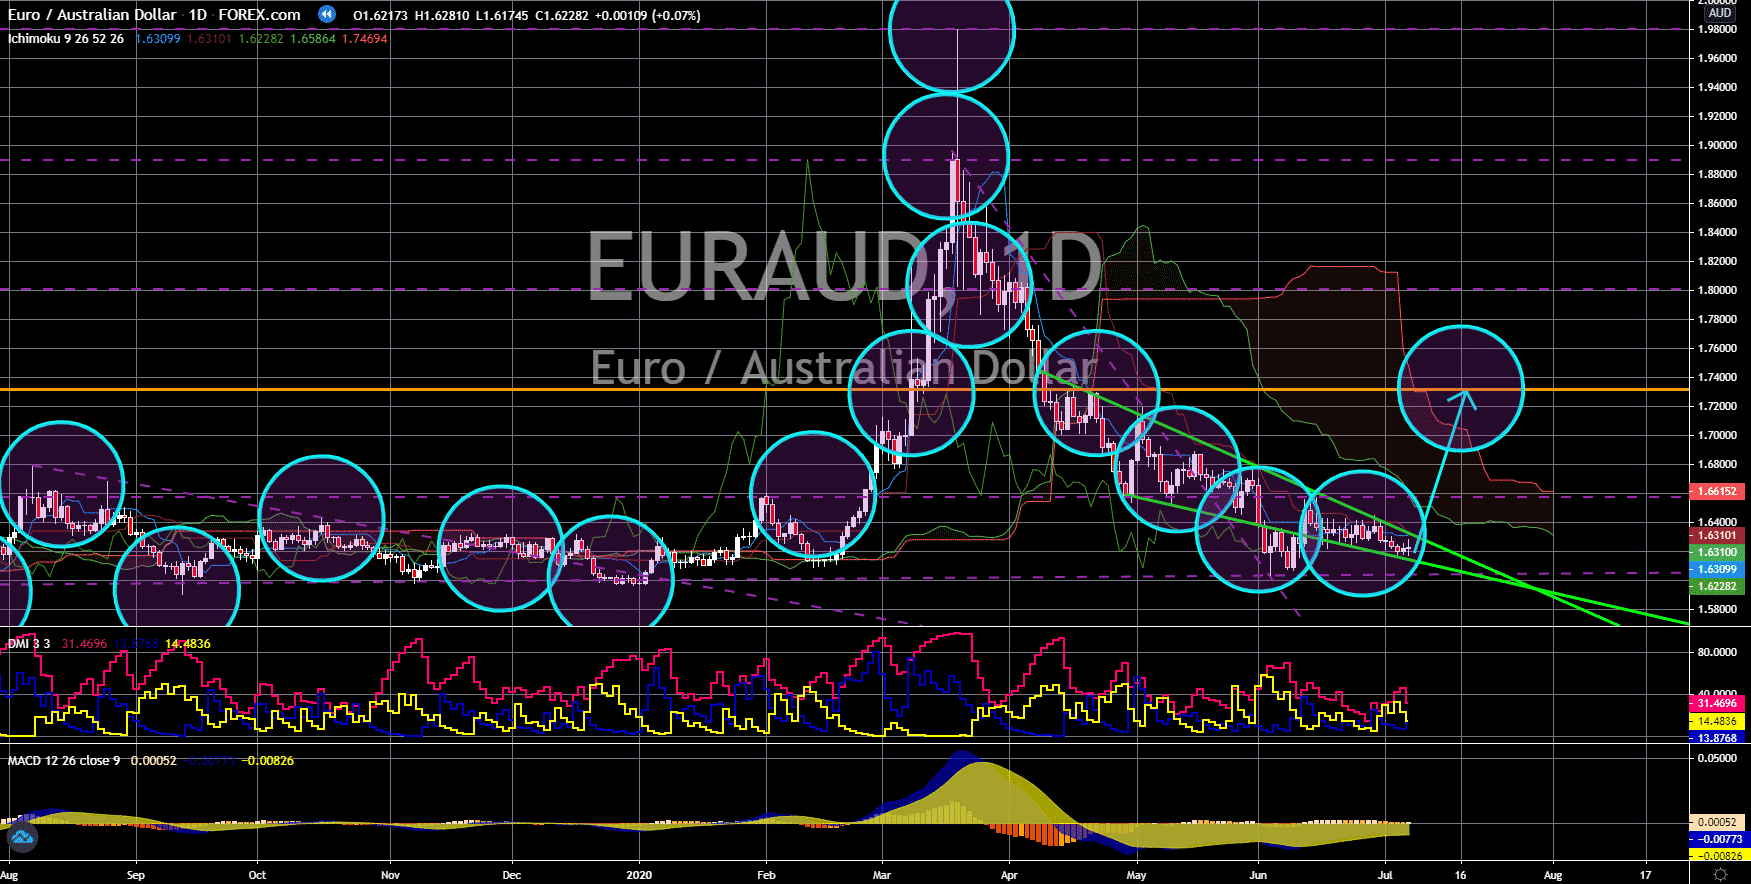 FinanceBrokerage - Market News: EUR/AUD Chart